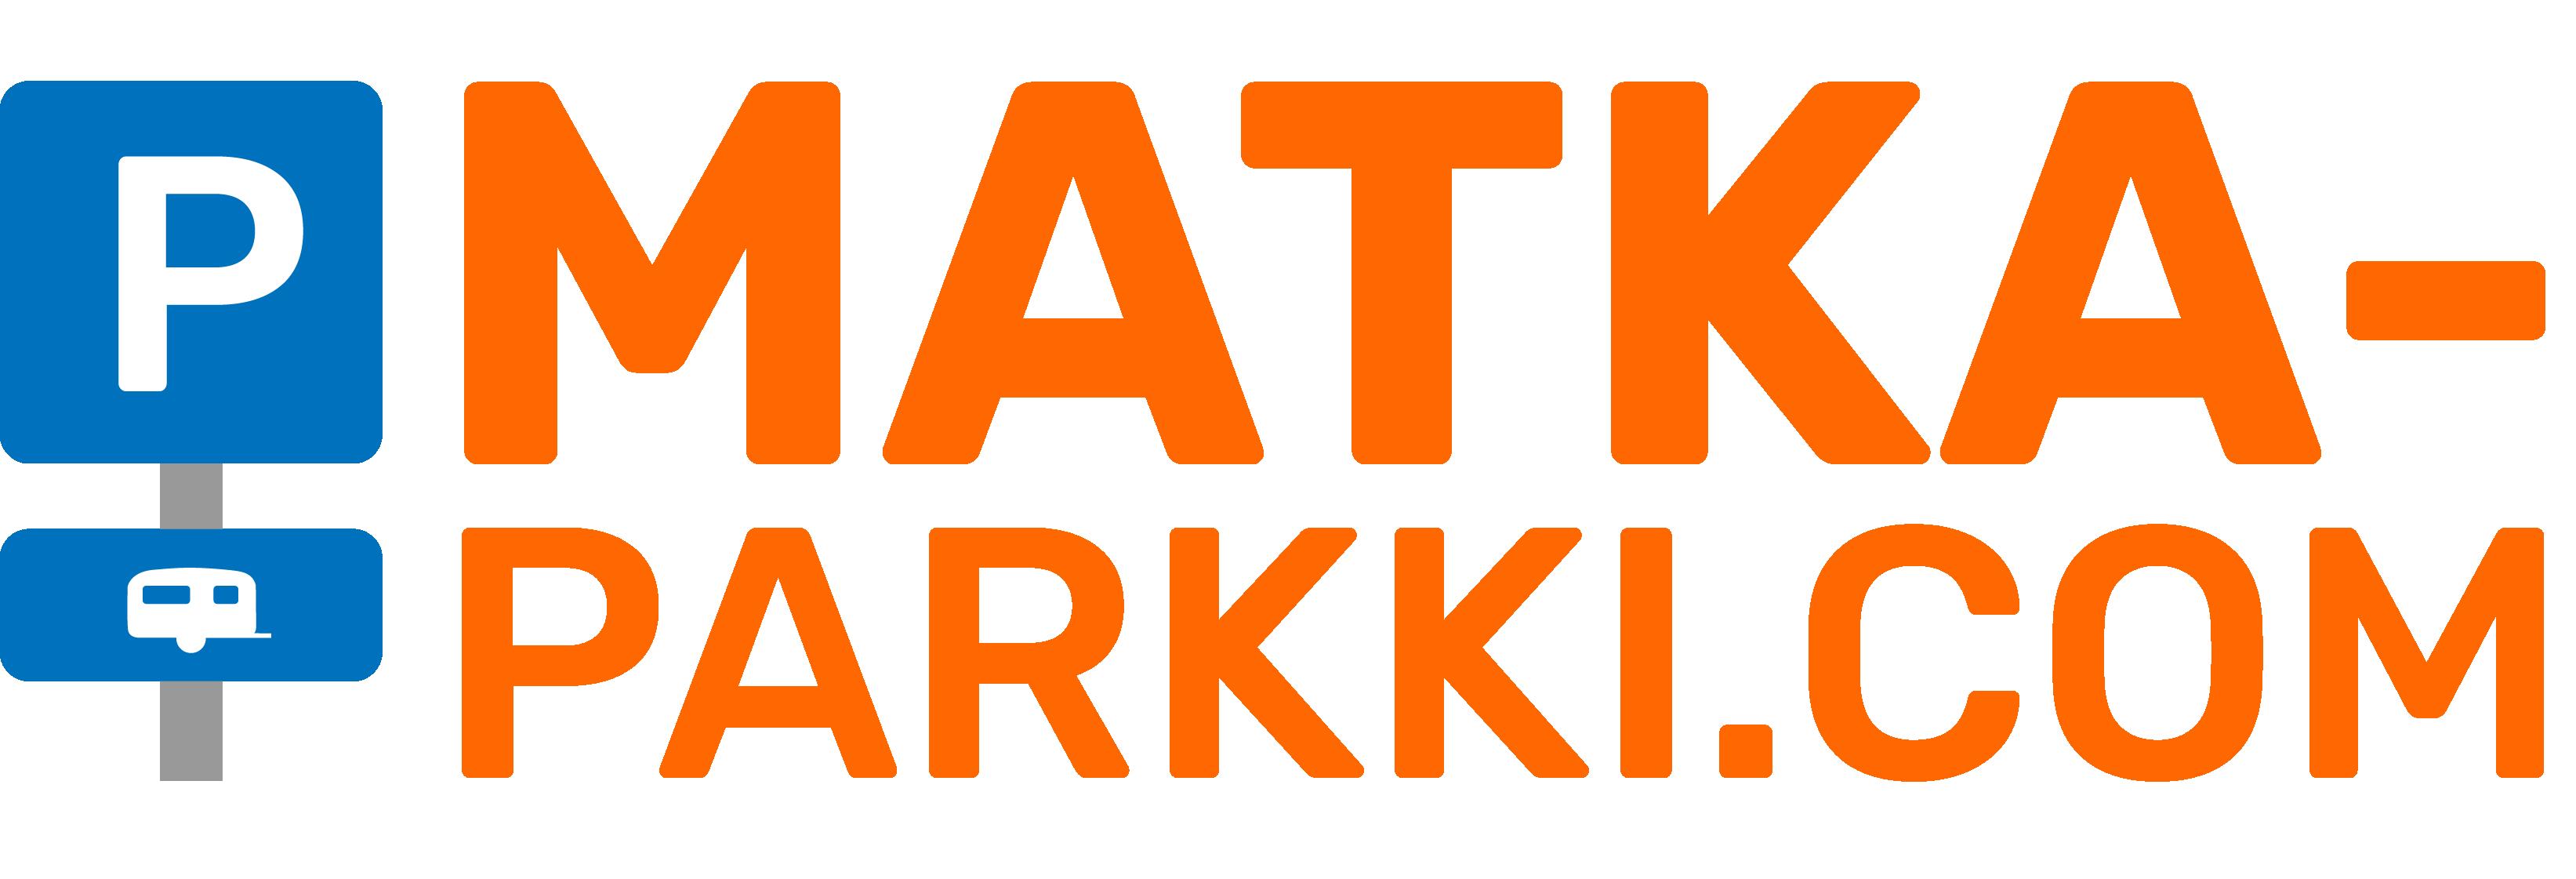 Matkaparkki.com